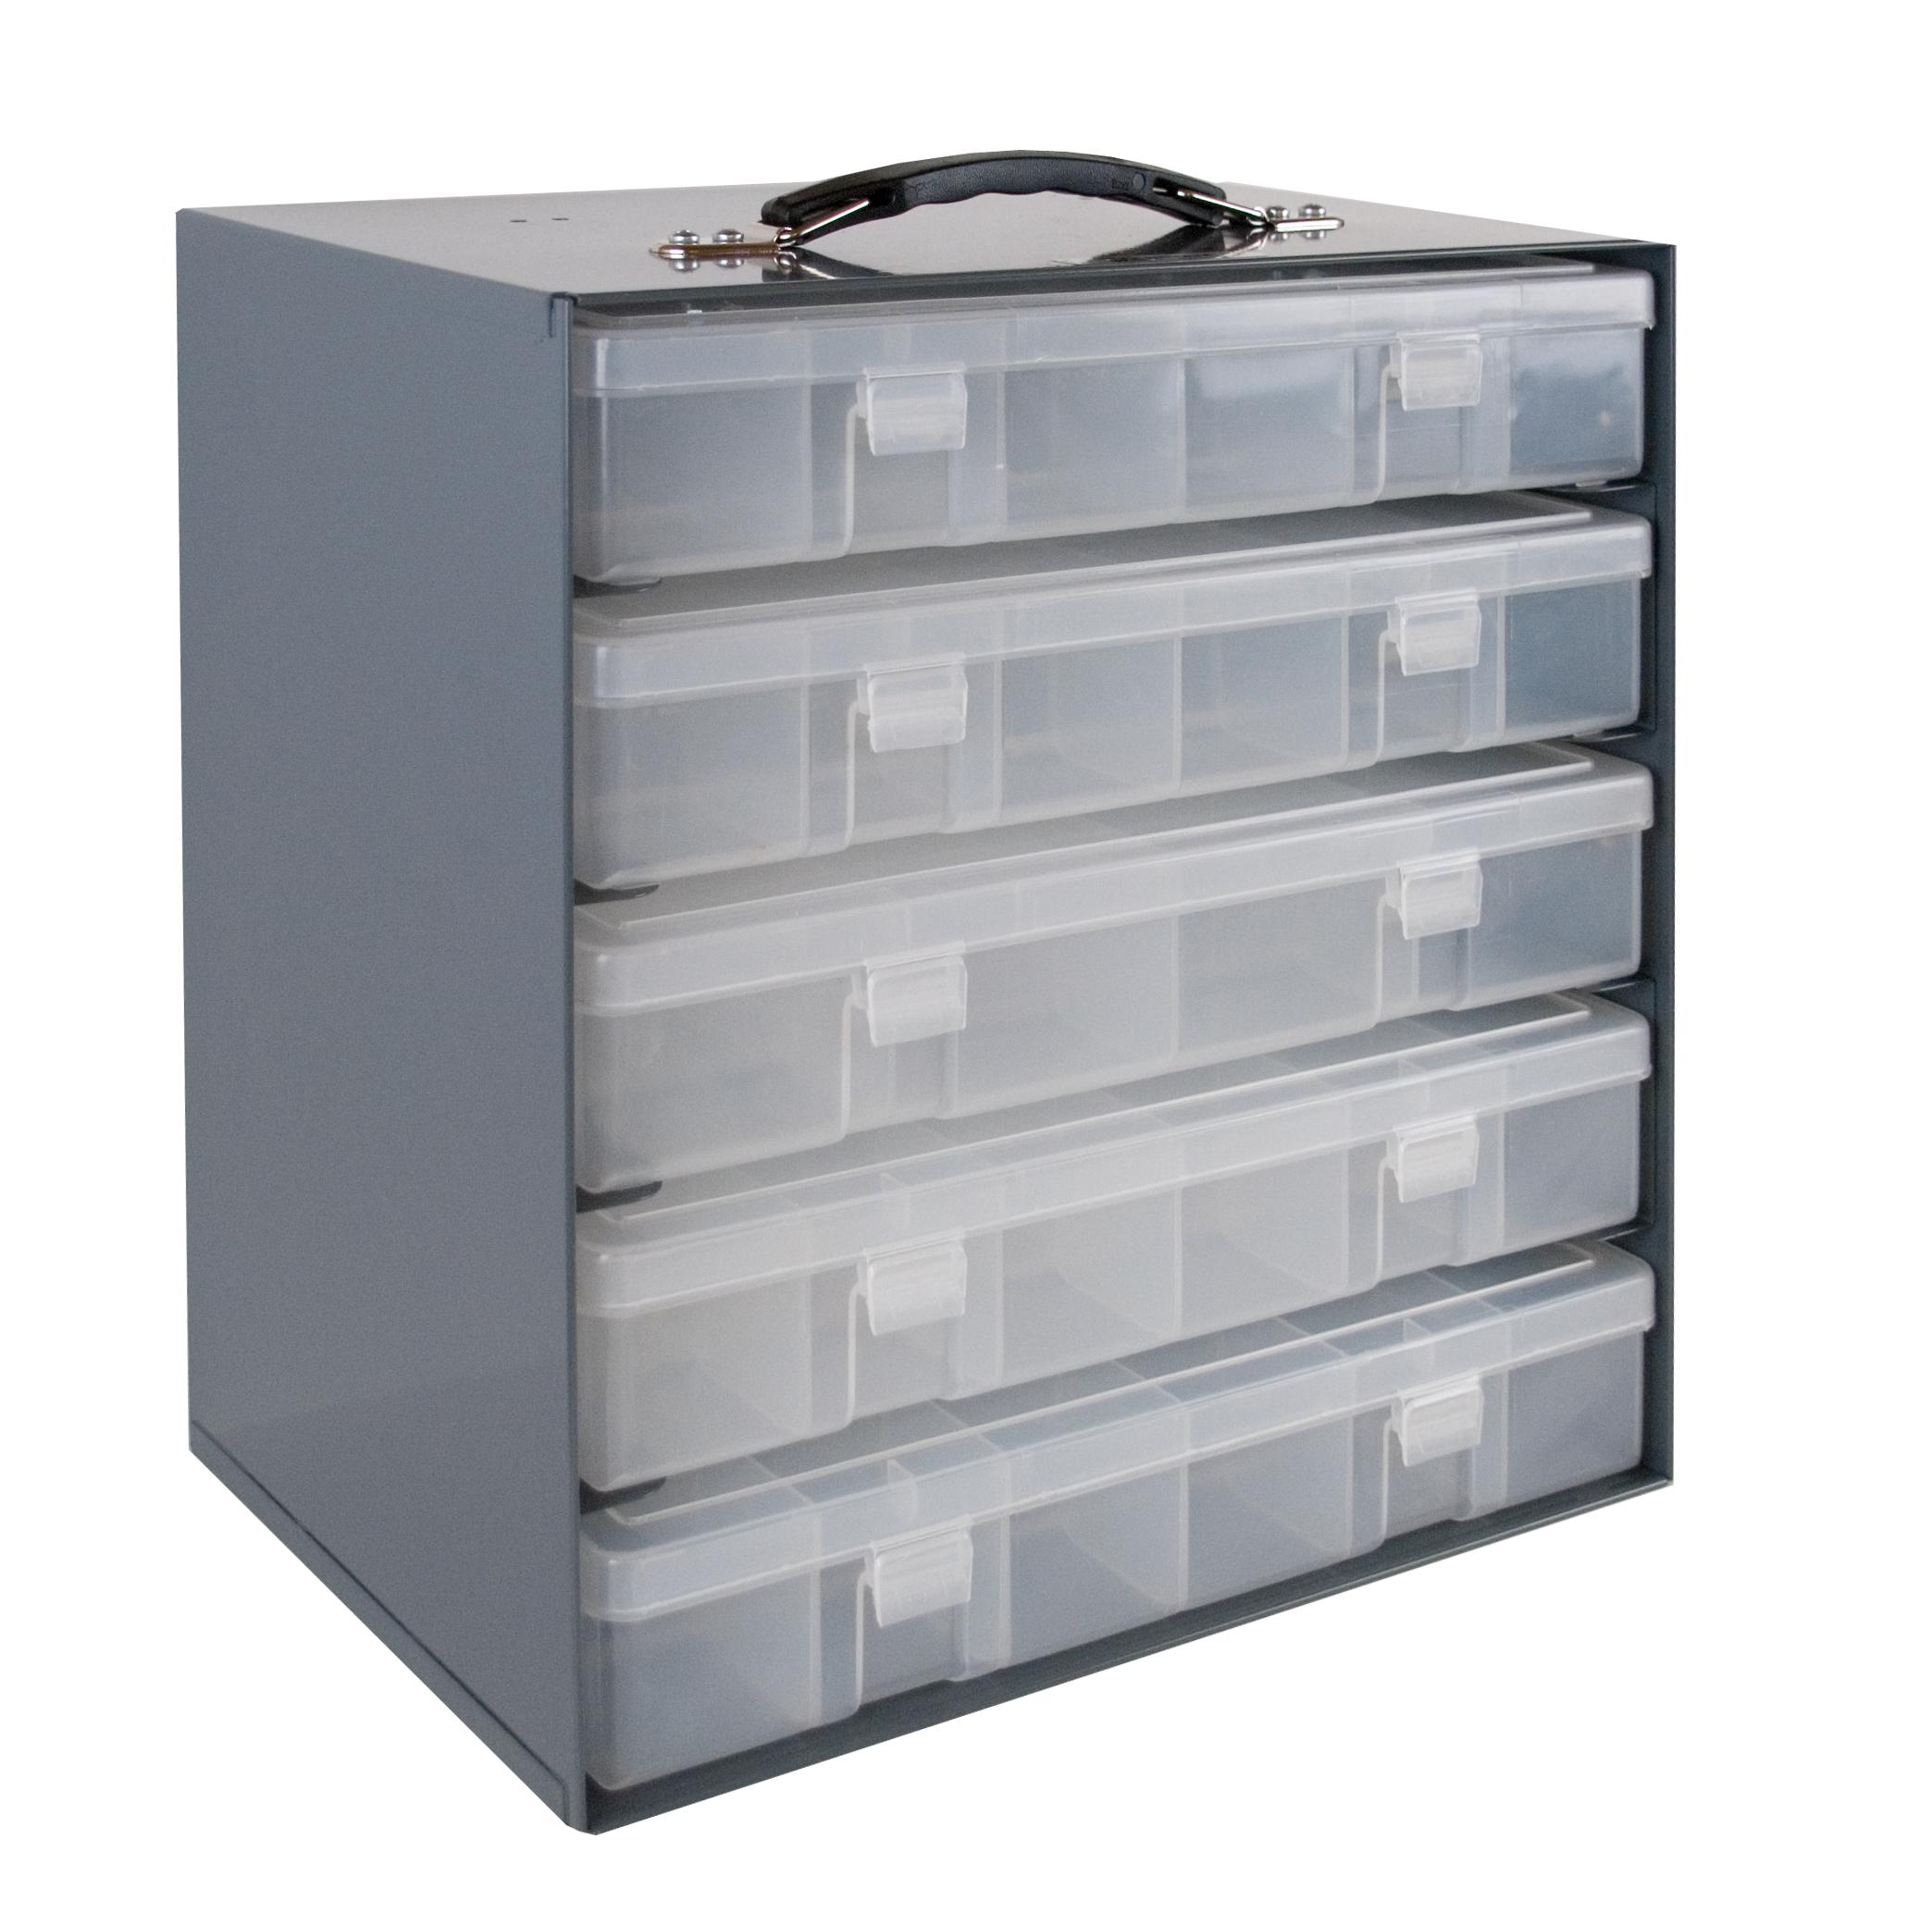 Model 291 95 Plastic partment Box Rack on visit